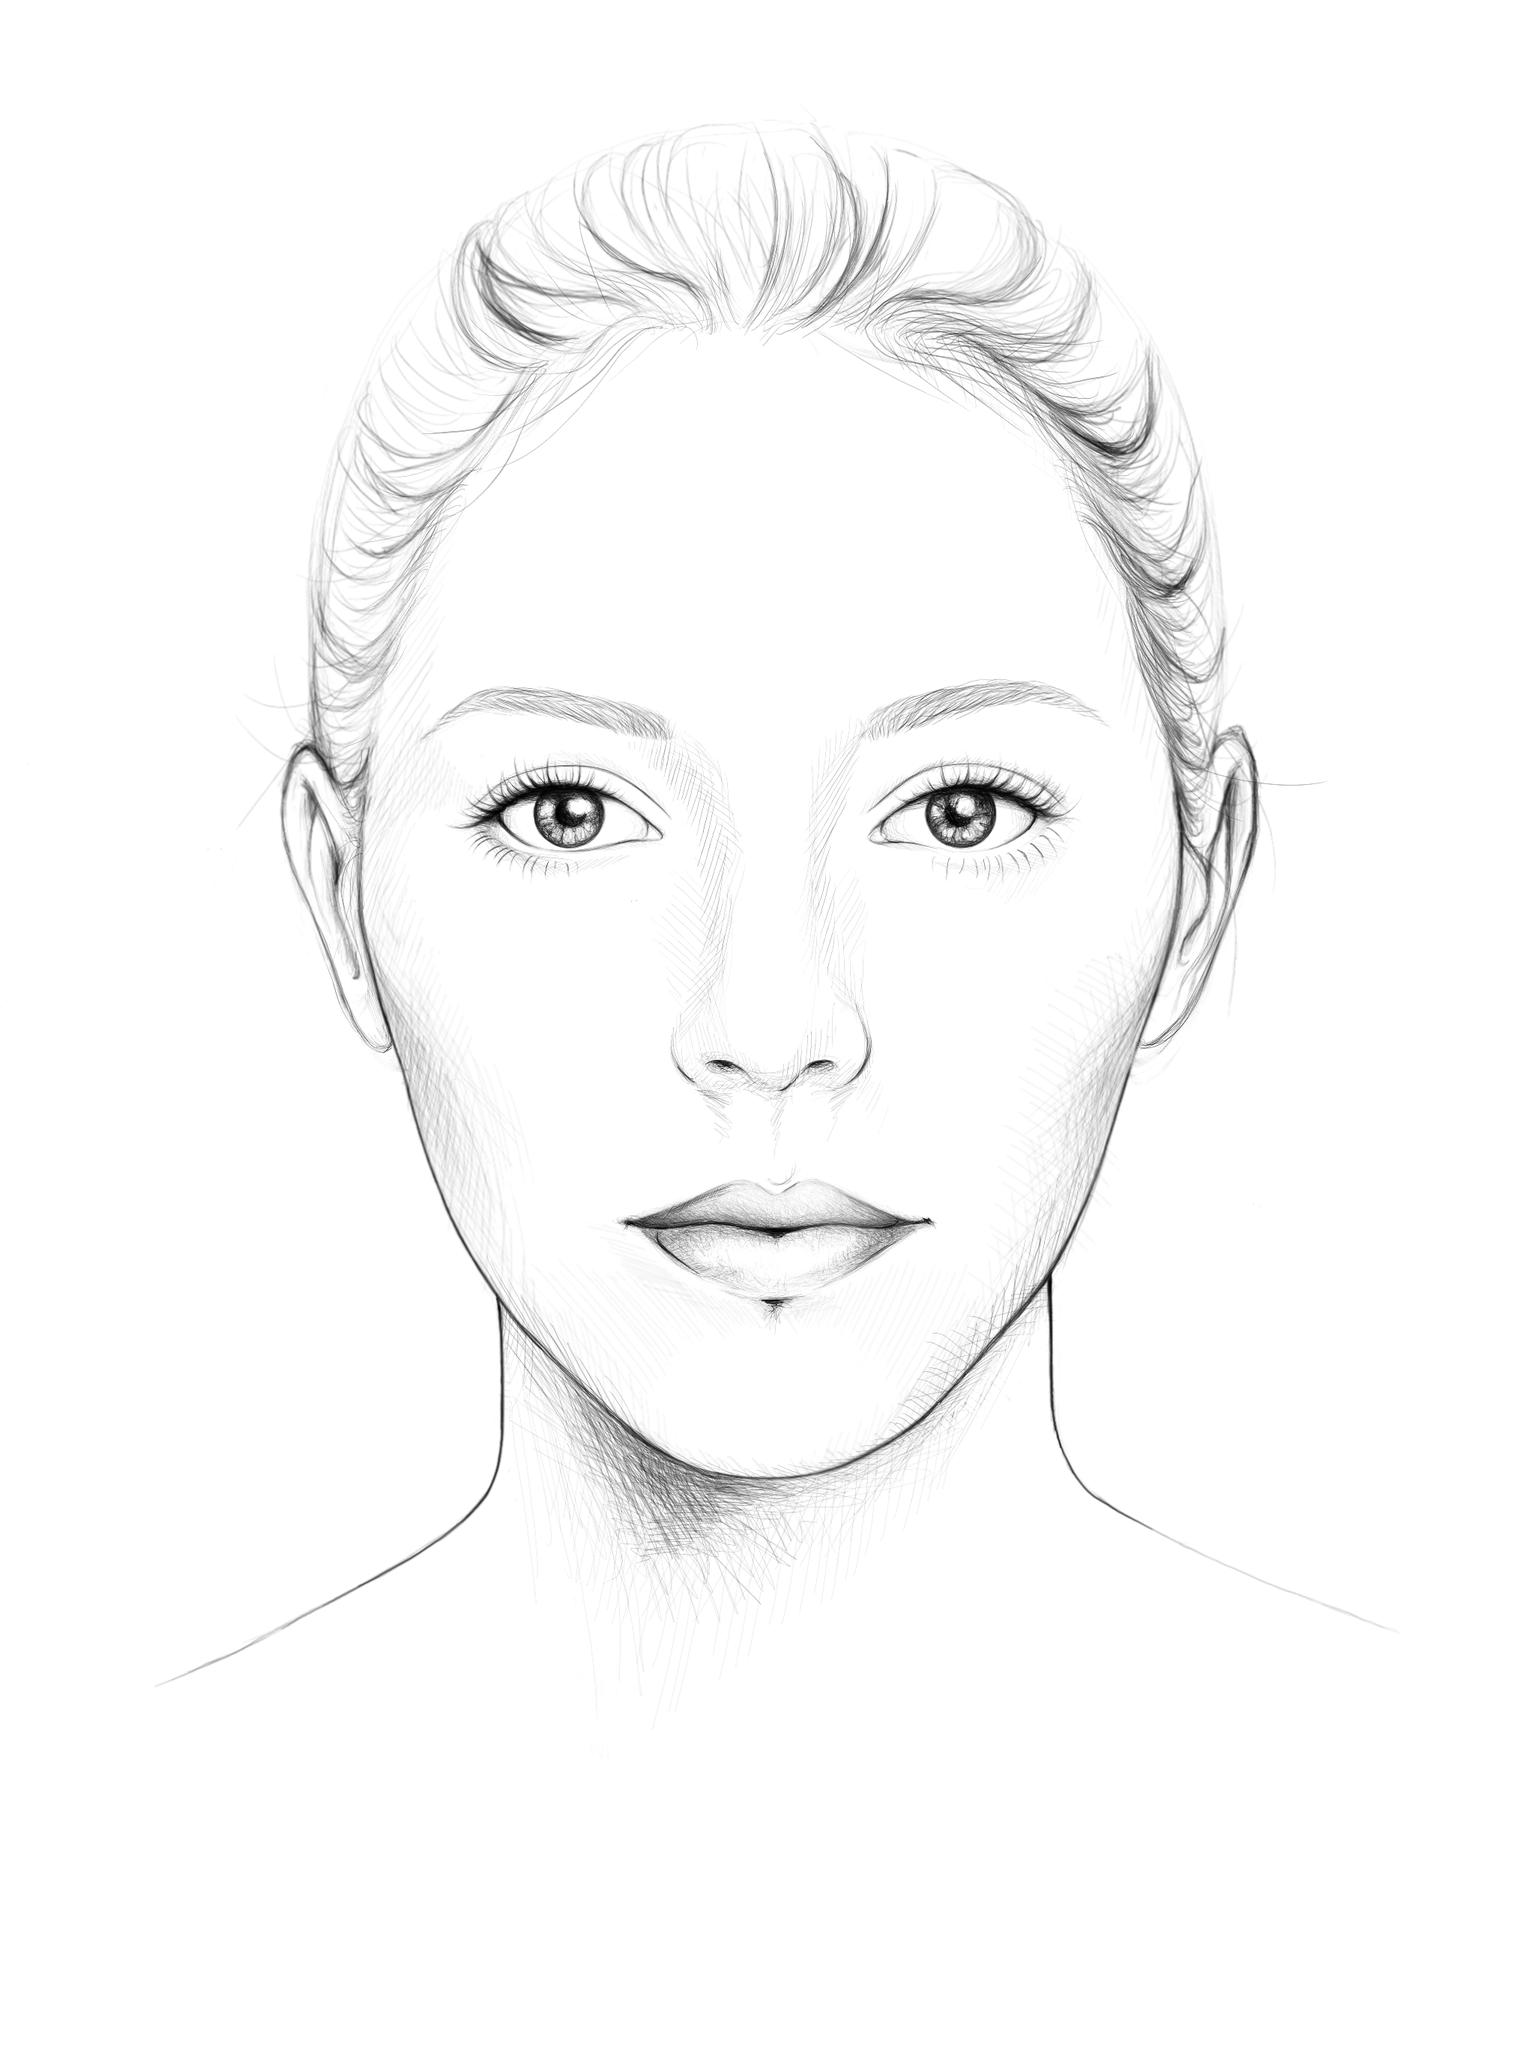 diamantförmiges Gesicht